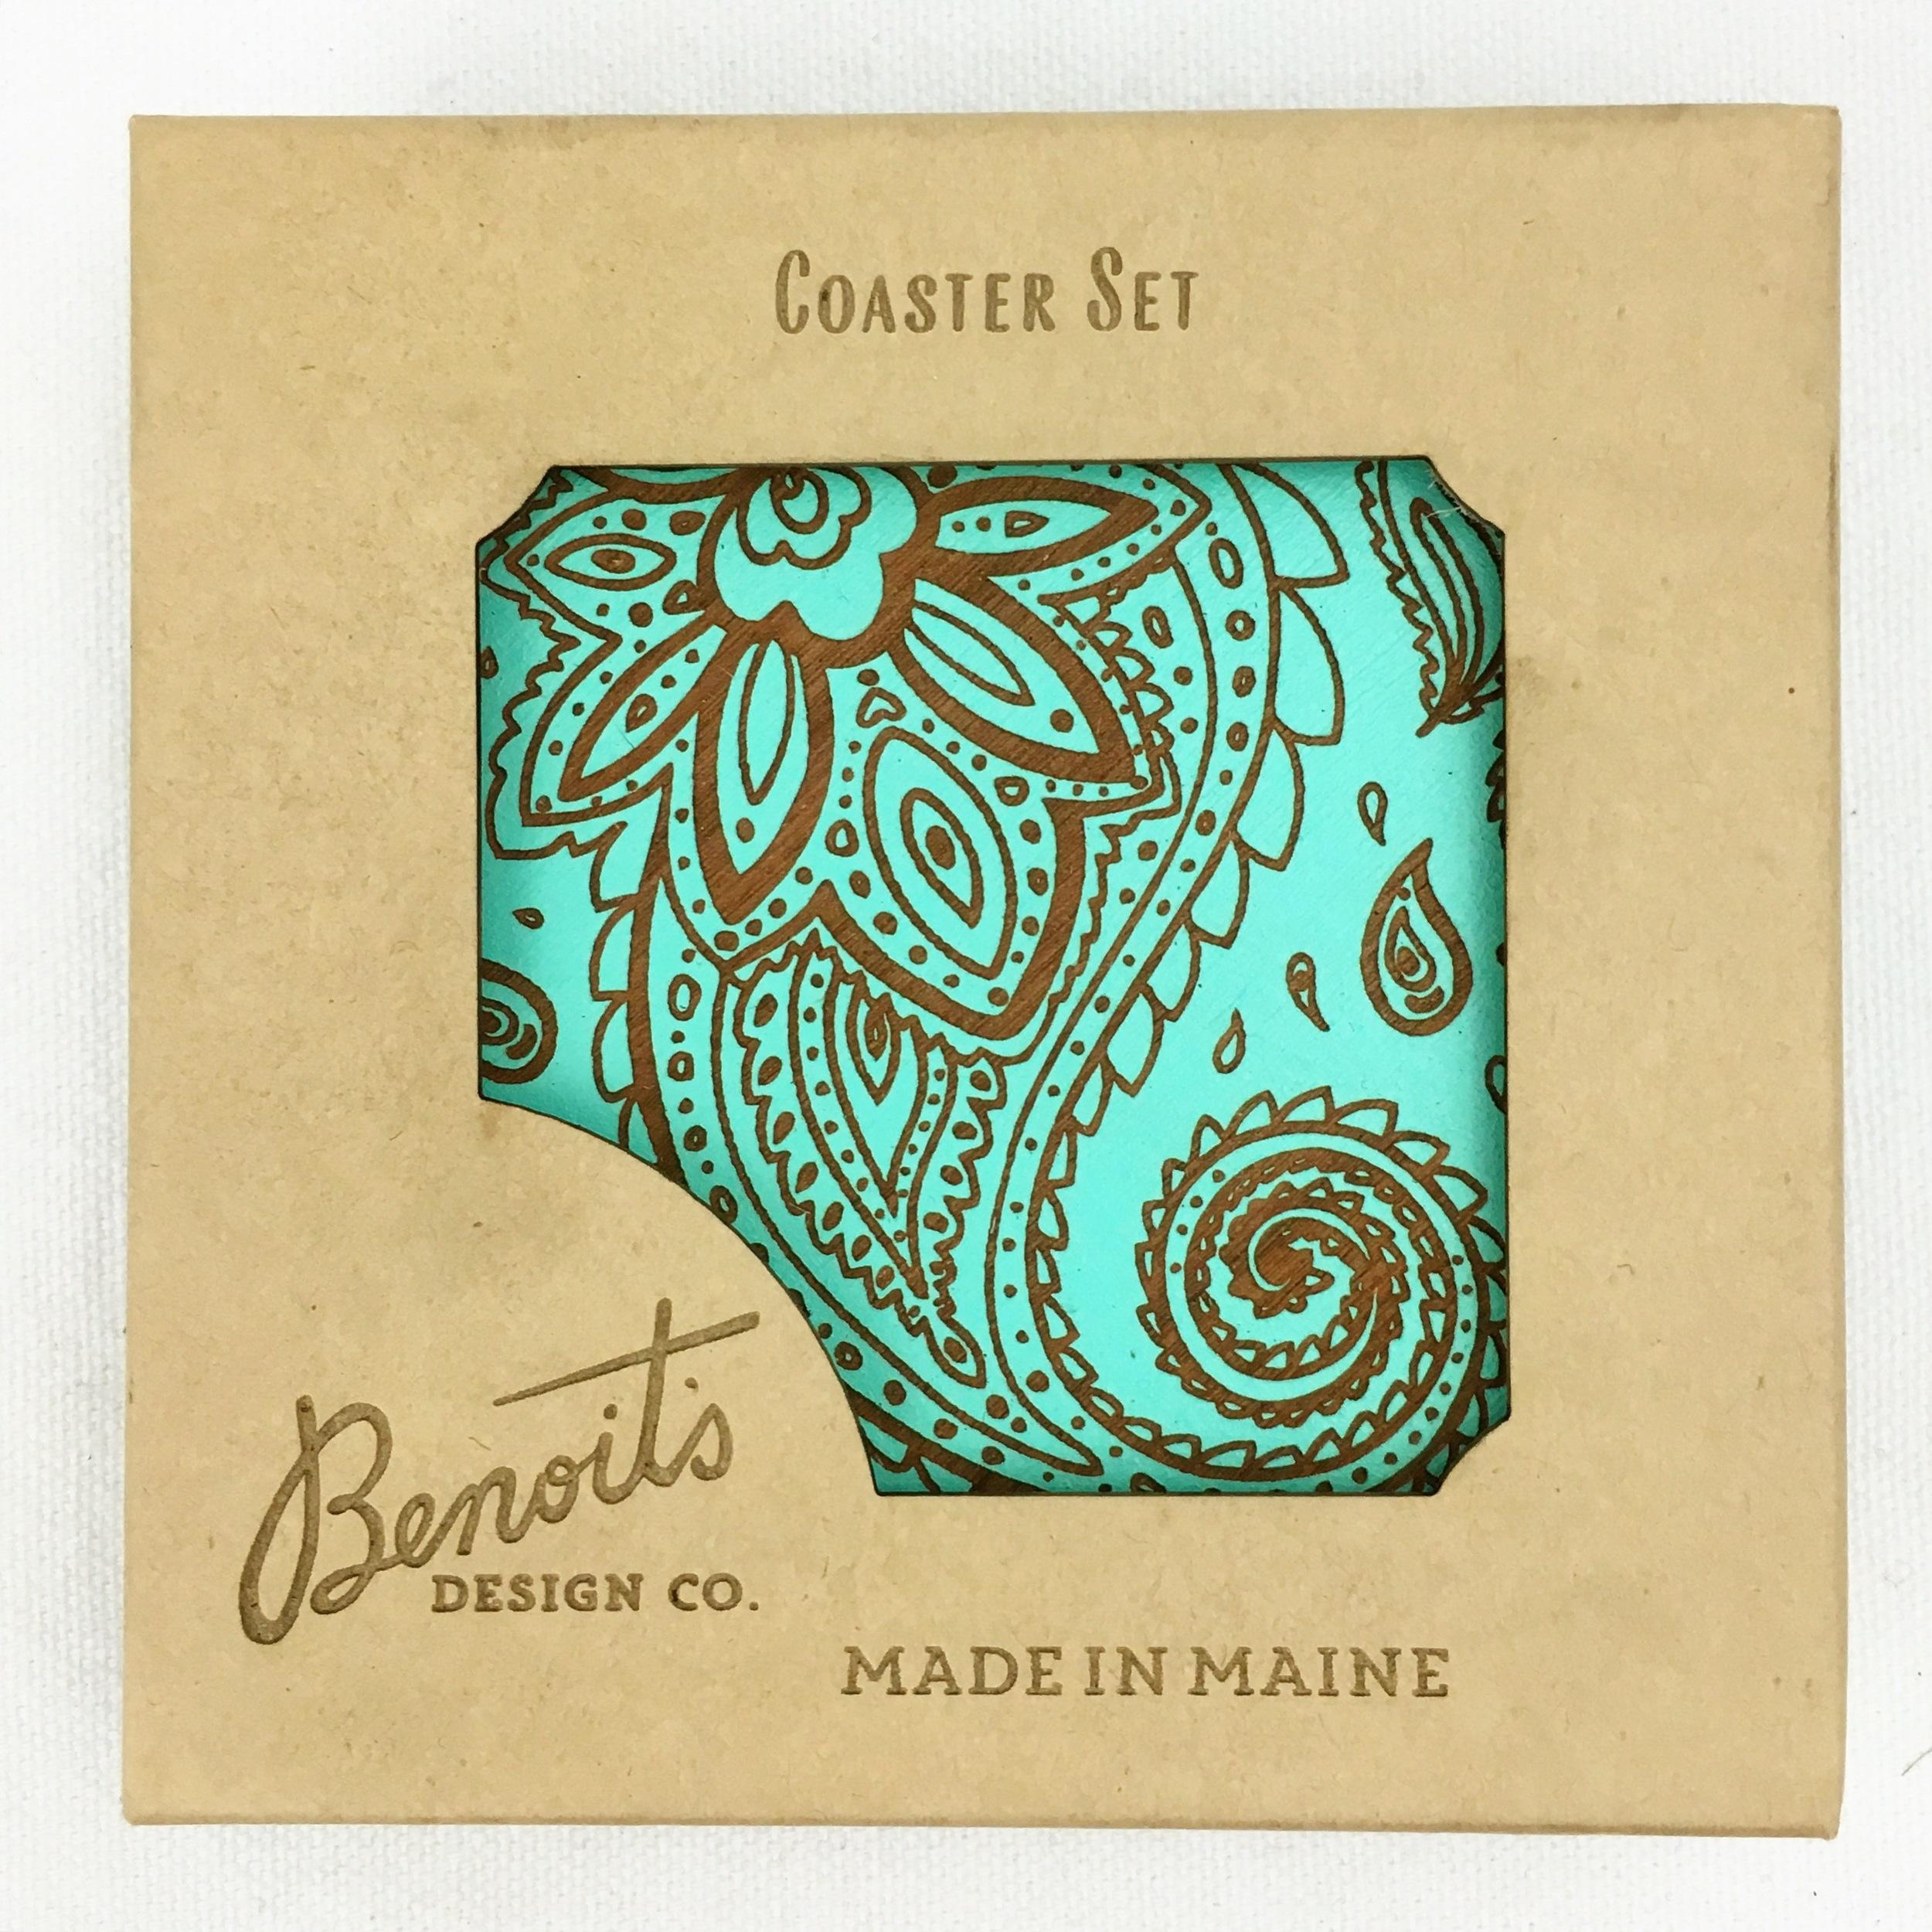 Benoit's Design Co. Coaster Packaging.JPG